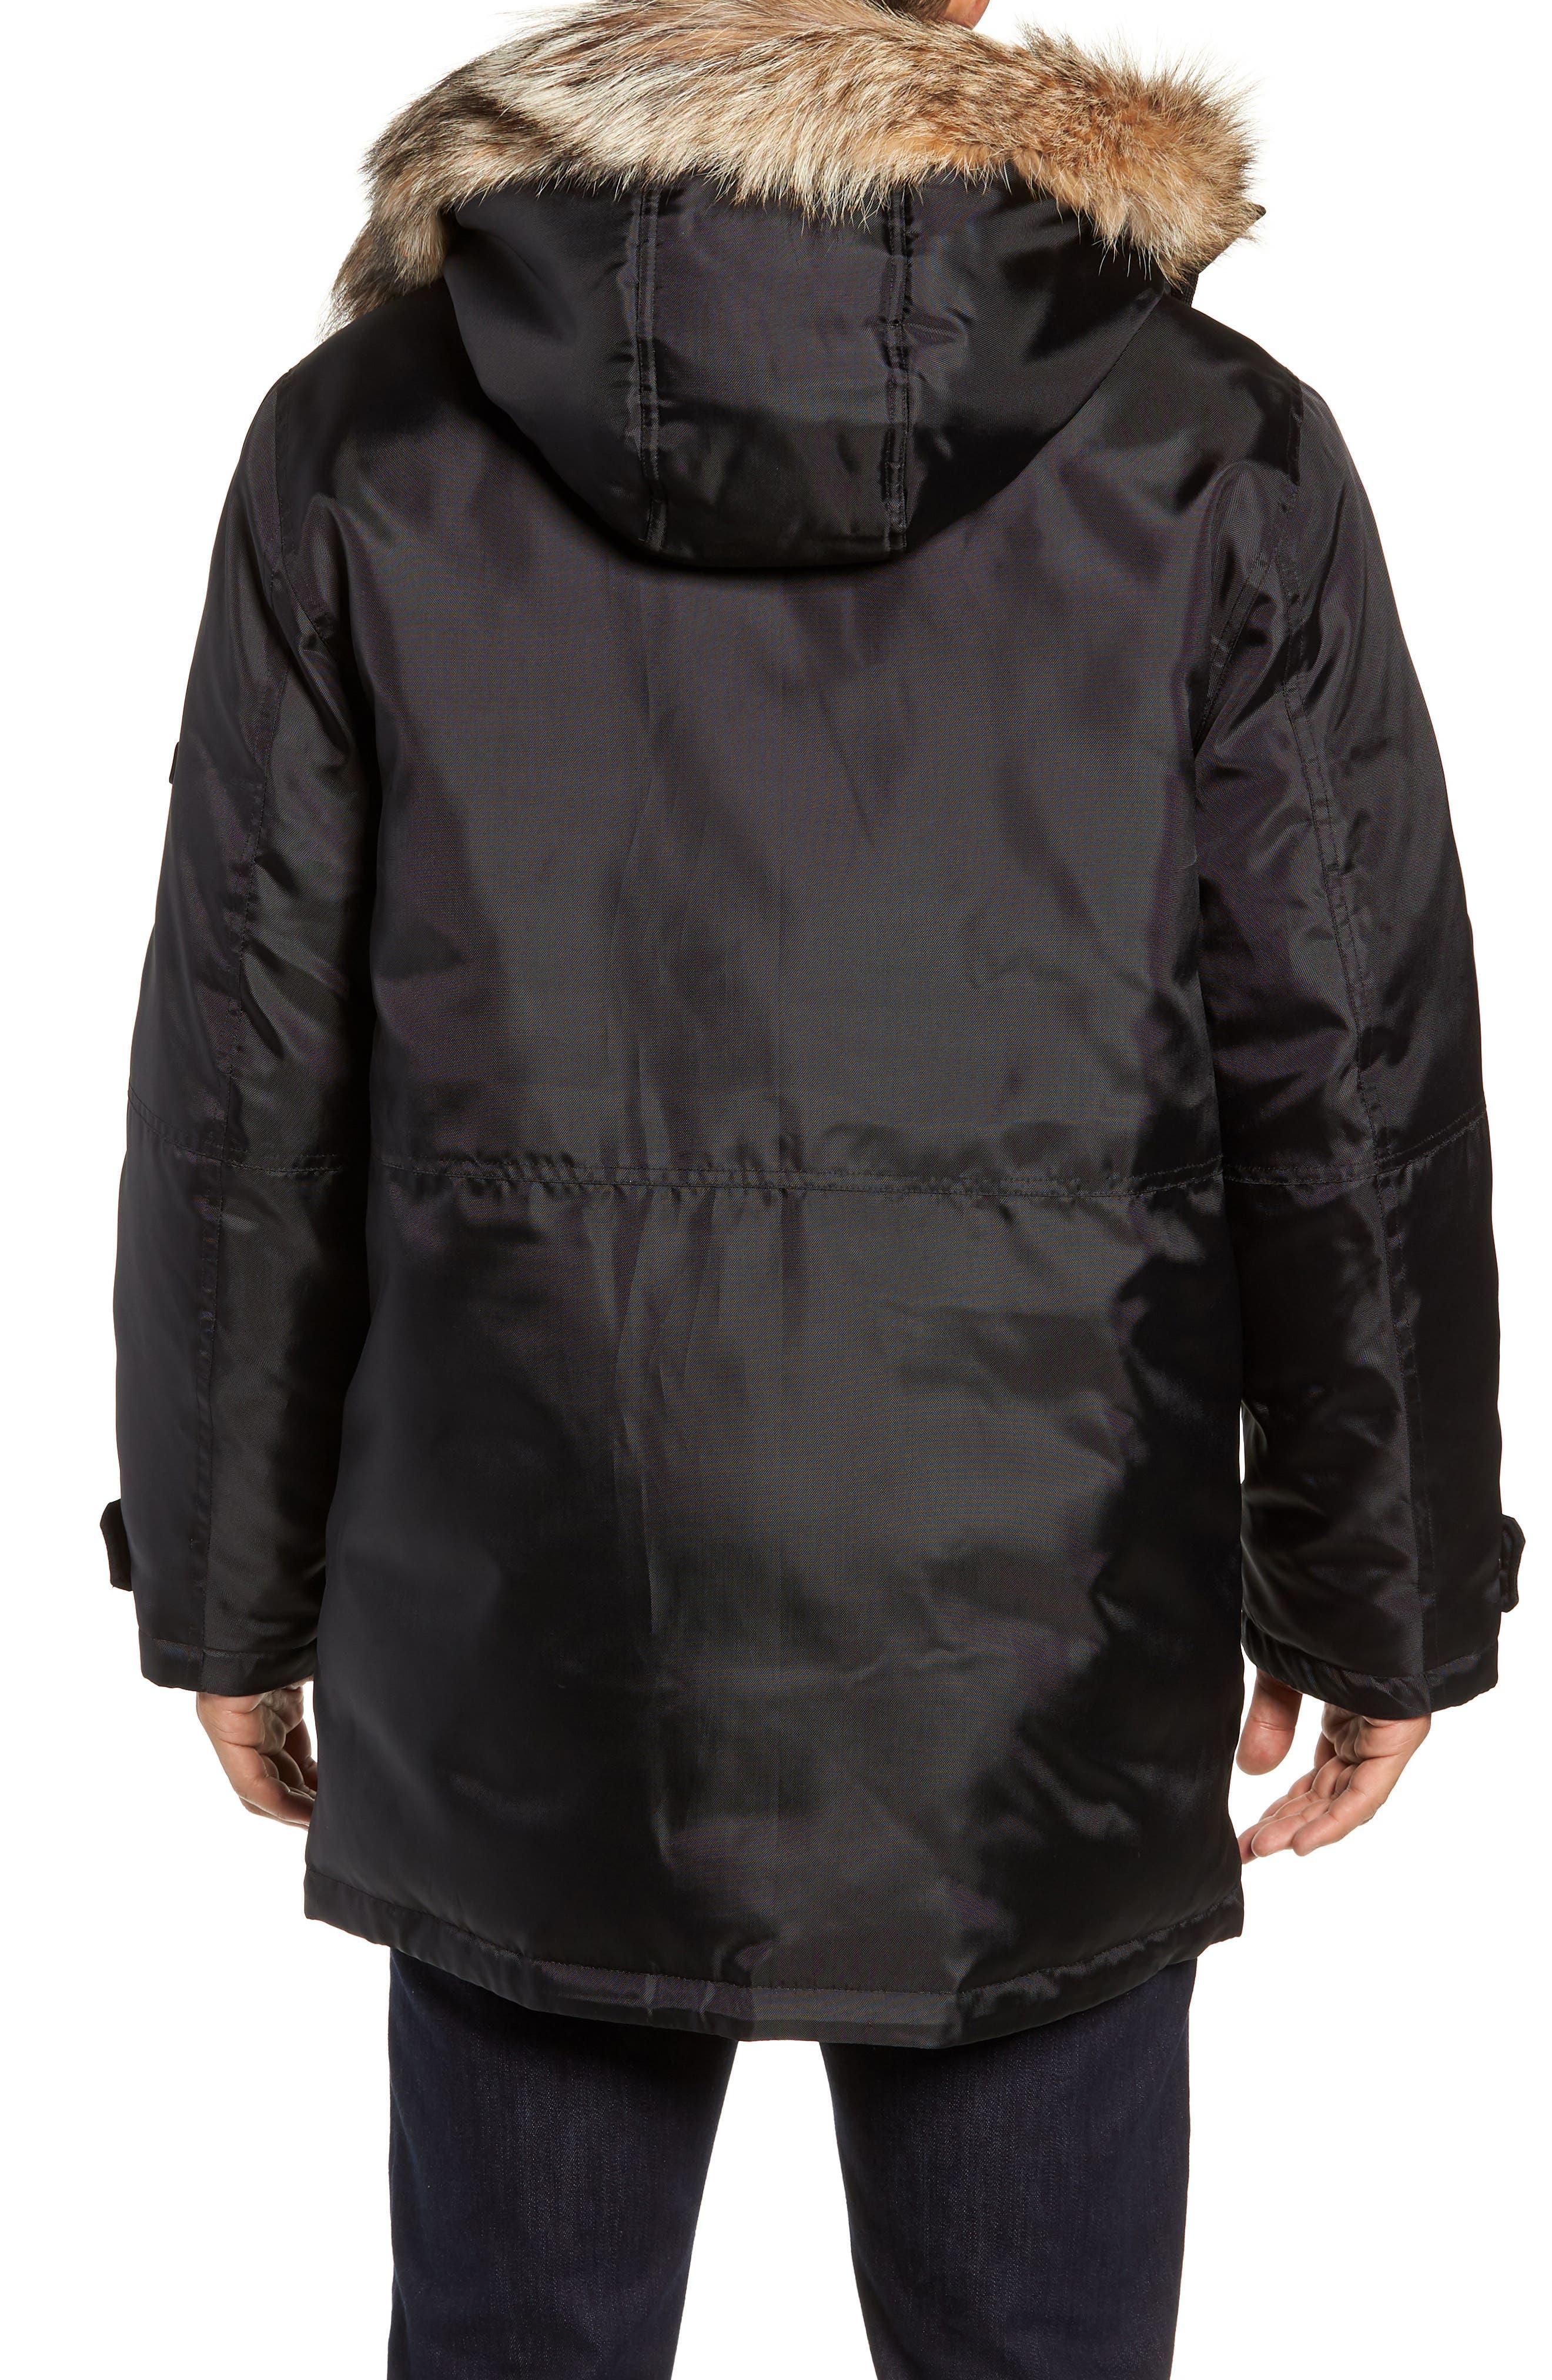 MARC NEW YORK, Lafayette Genuine Fur Trim Hooded Parka, Alternate thumbnail 2, color, BLACK